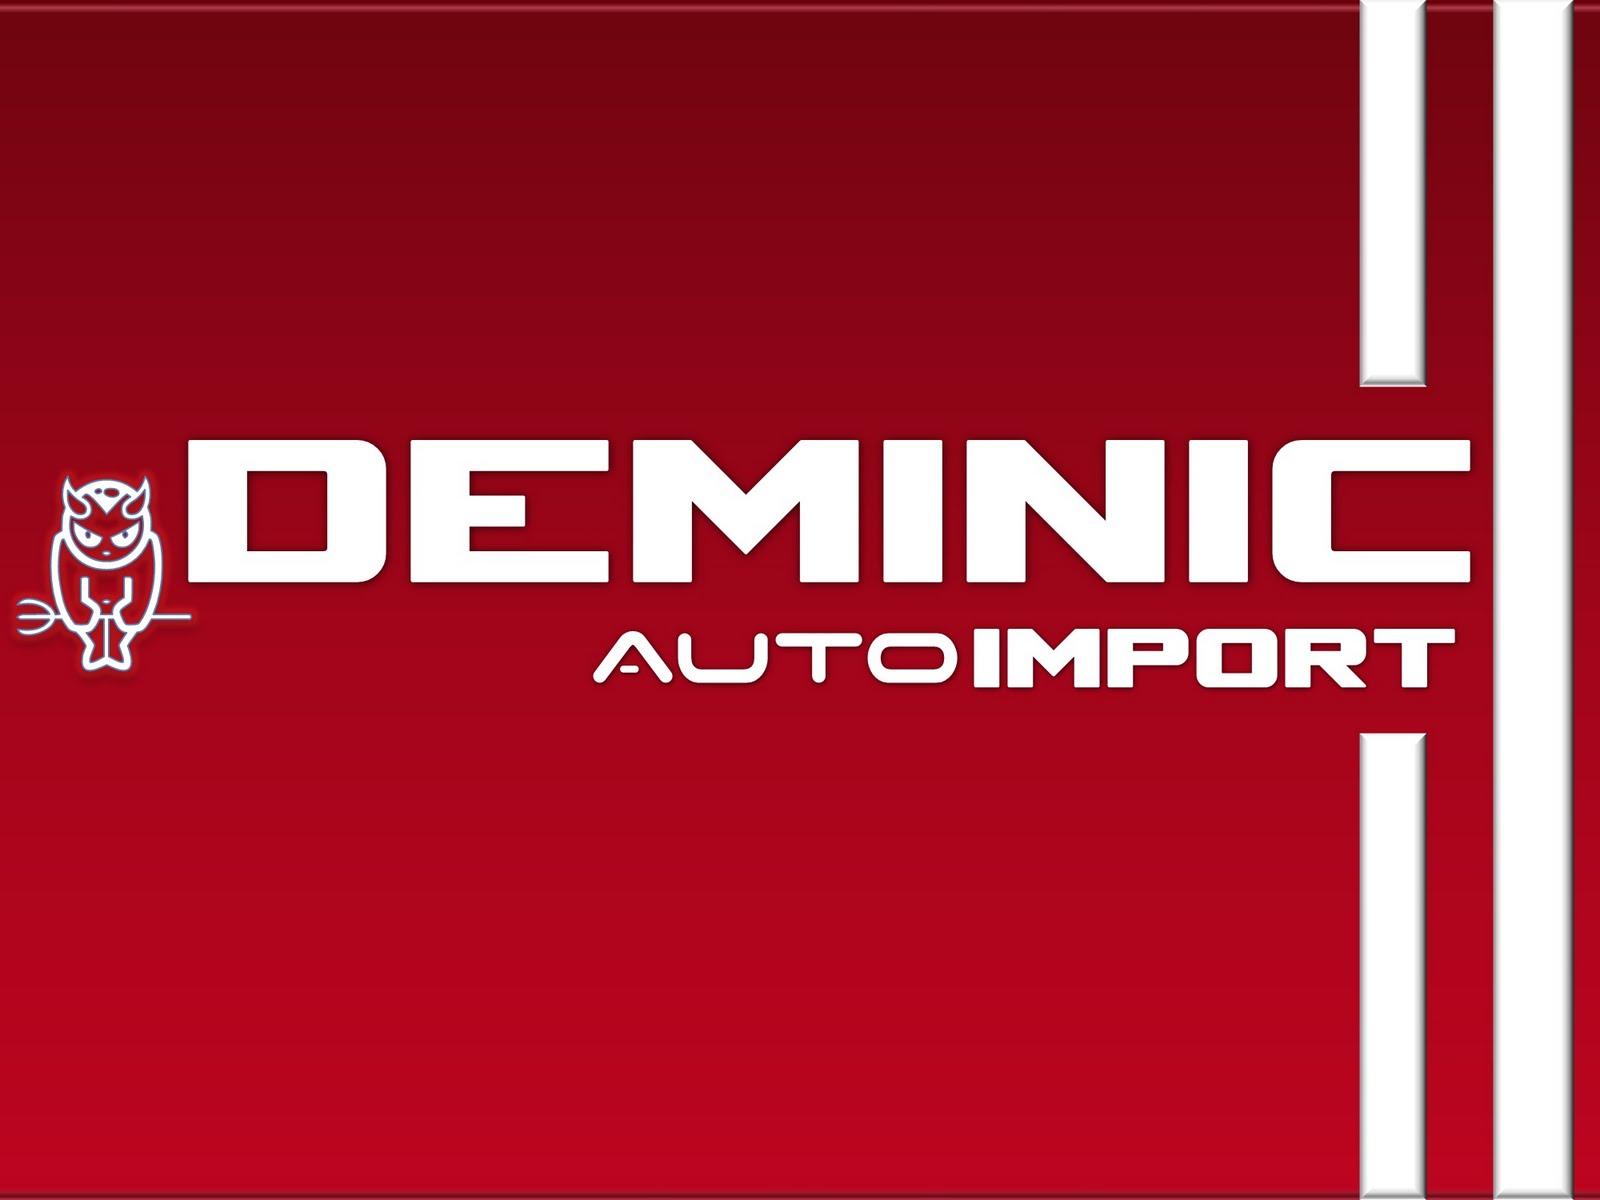 deminic autoimport contact us. Black Bedroom Furniture Sets. Home Design Ideas